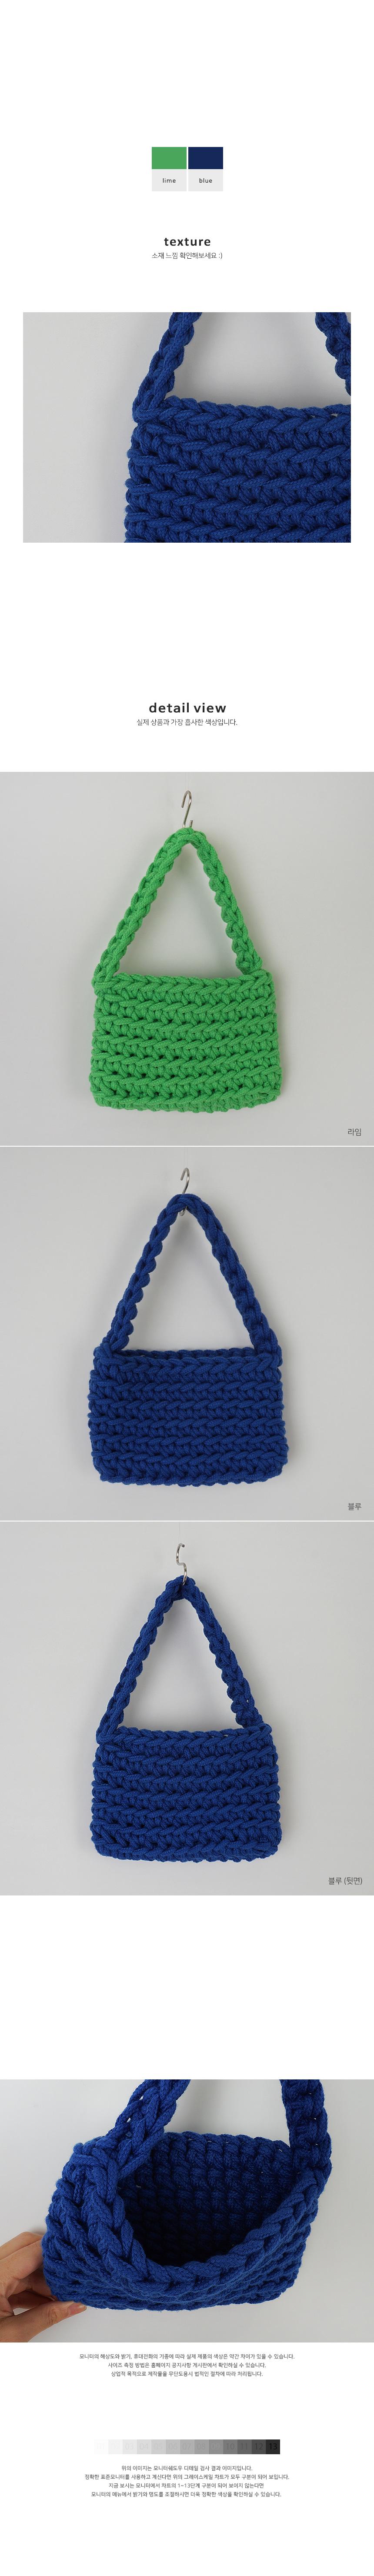 Handmade Knitwear Tote Bag